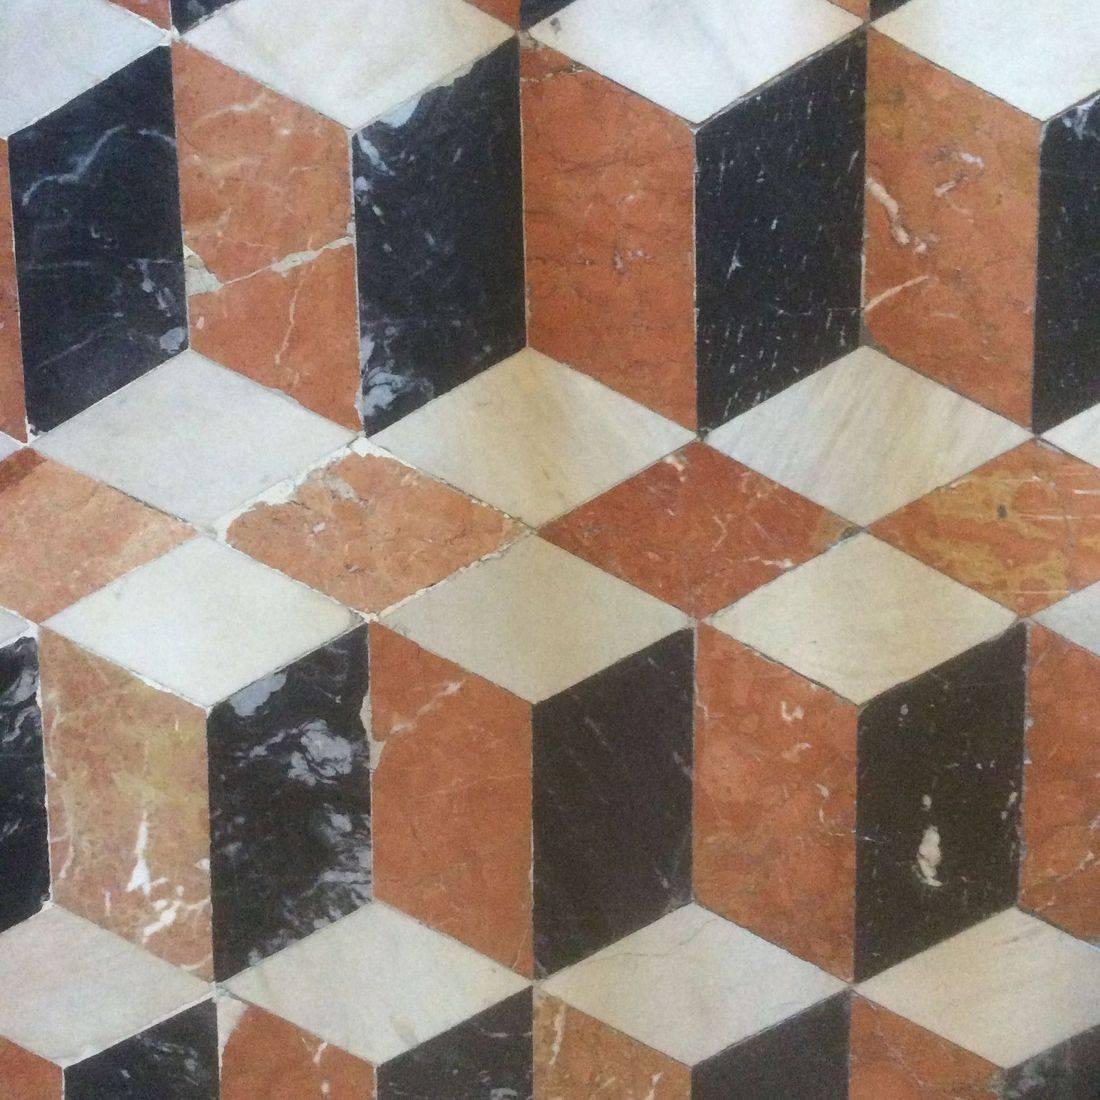 Training and Development image - geometric tiles